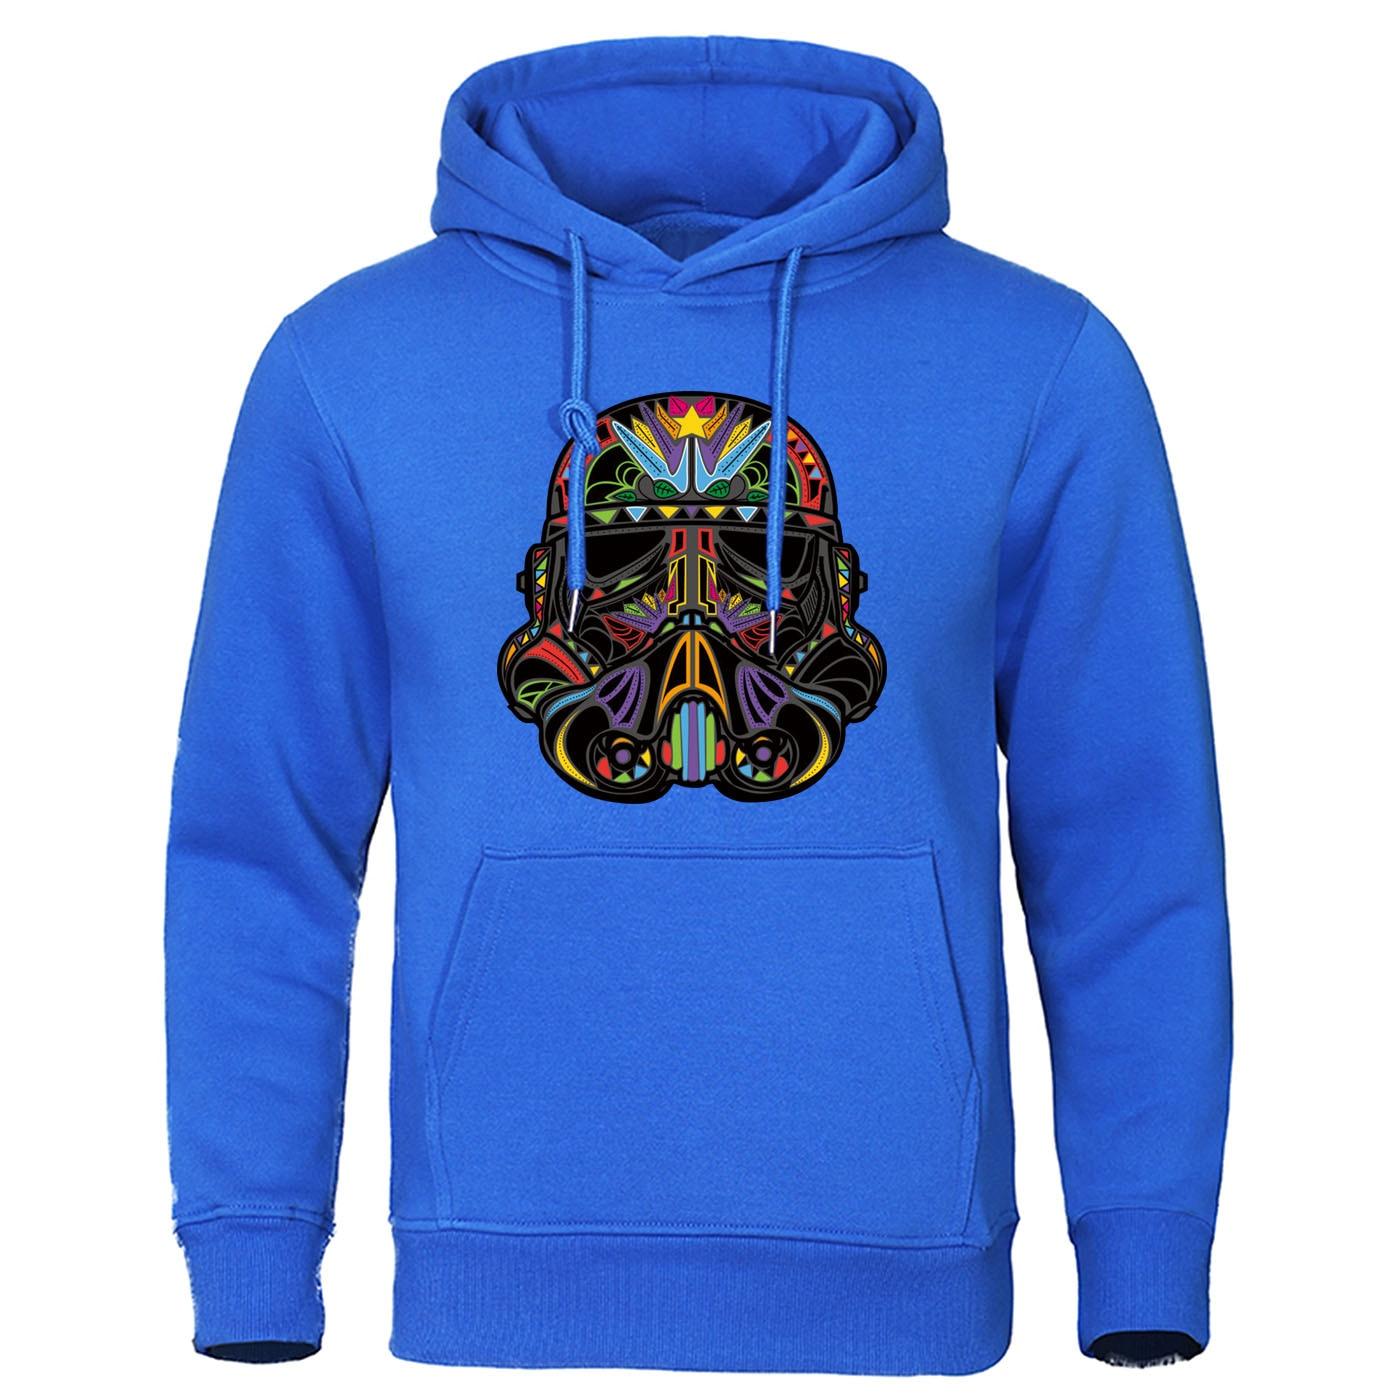 Movies Fashion Mens Clothing Funny Print Hoodie Sweatshirt Harajuku Hoodies Men Pullover Hip Hop Streetwear Man Casual Hoody